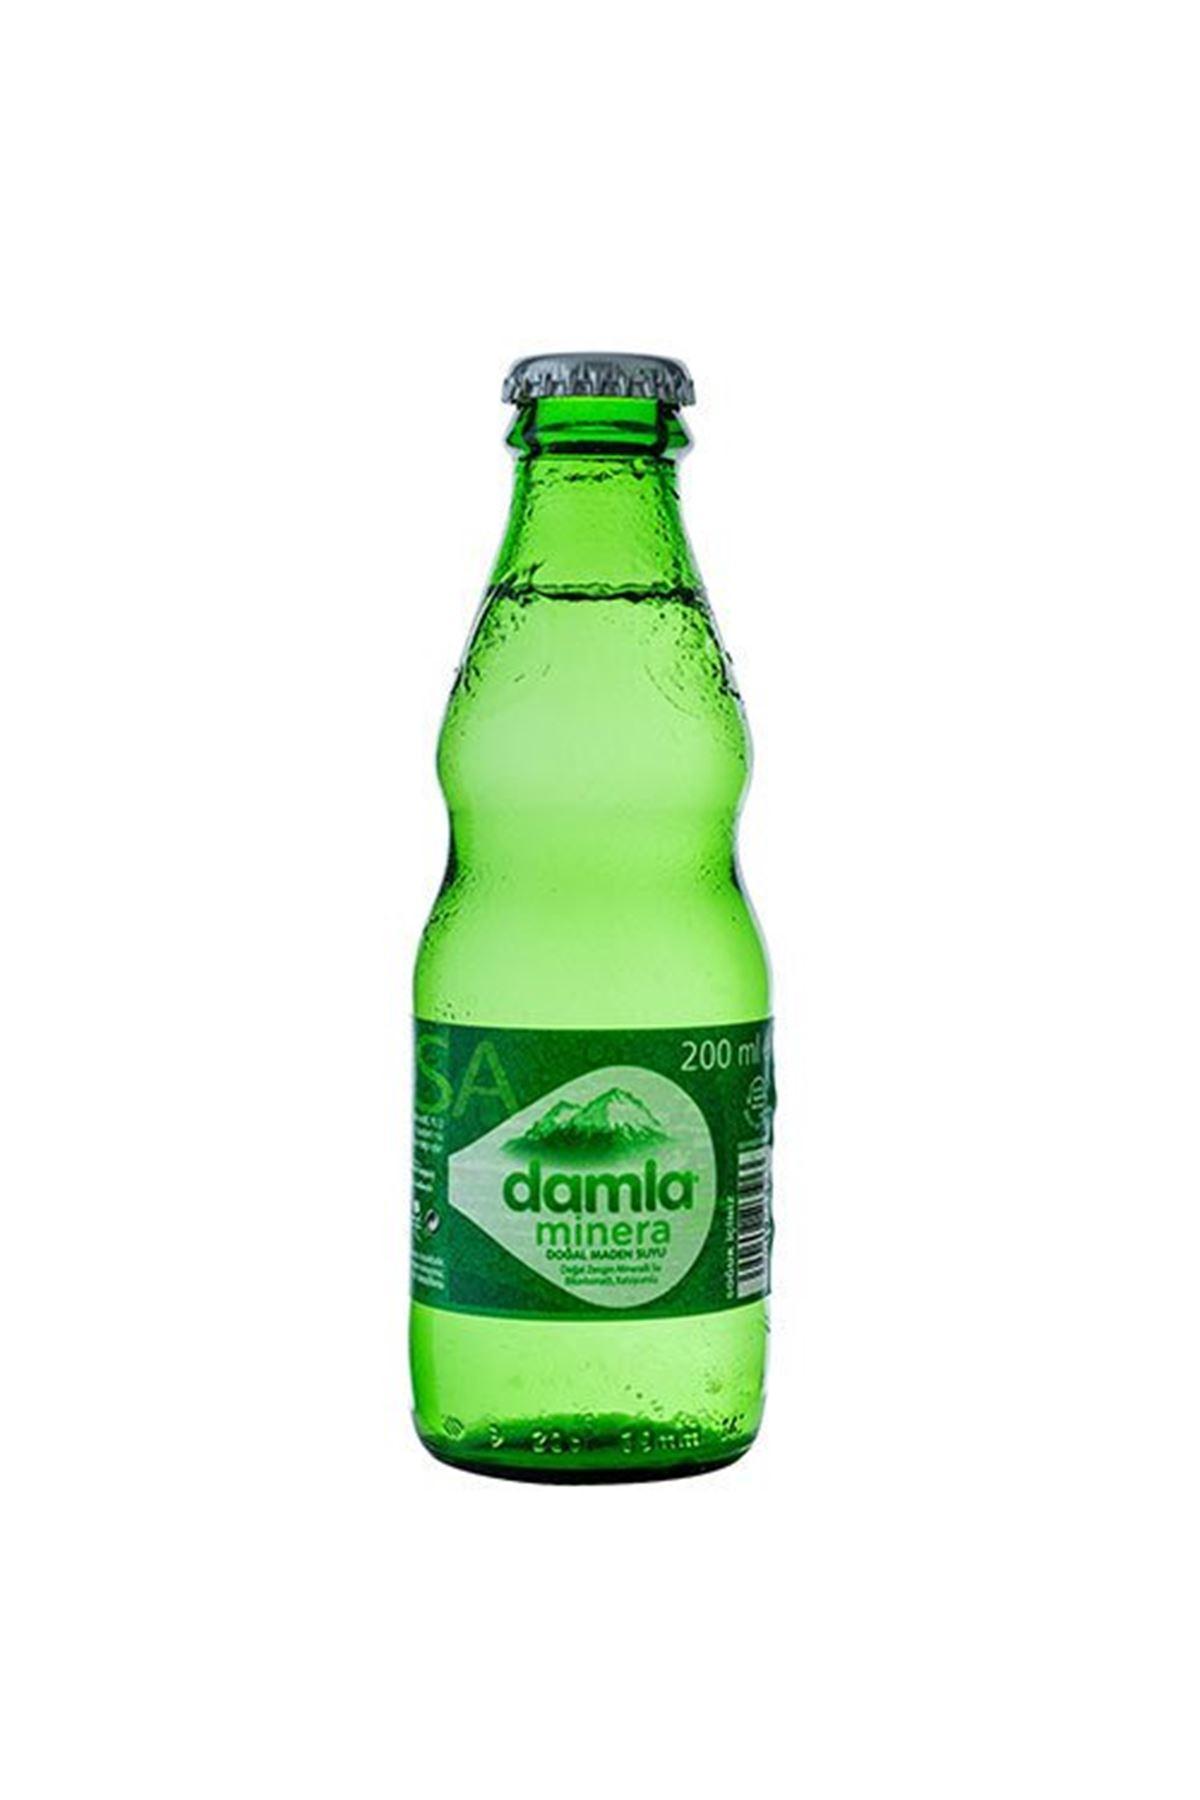 SADE SODA - 200 ml